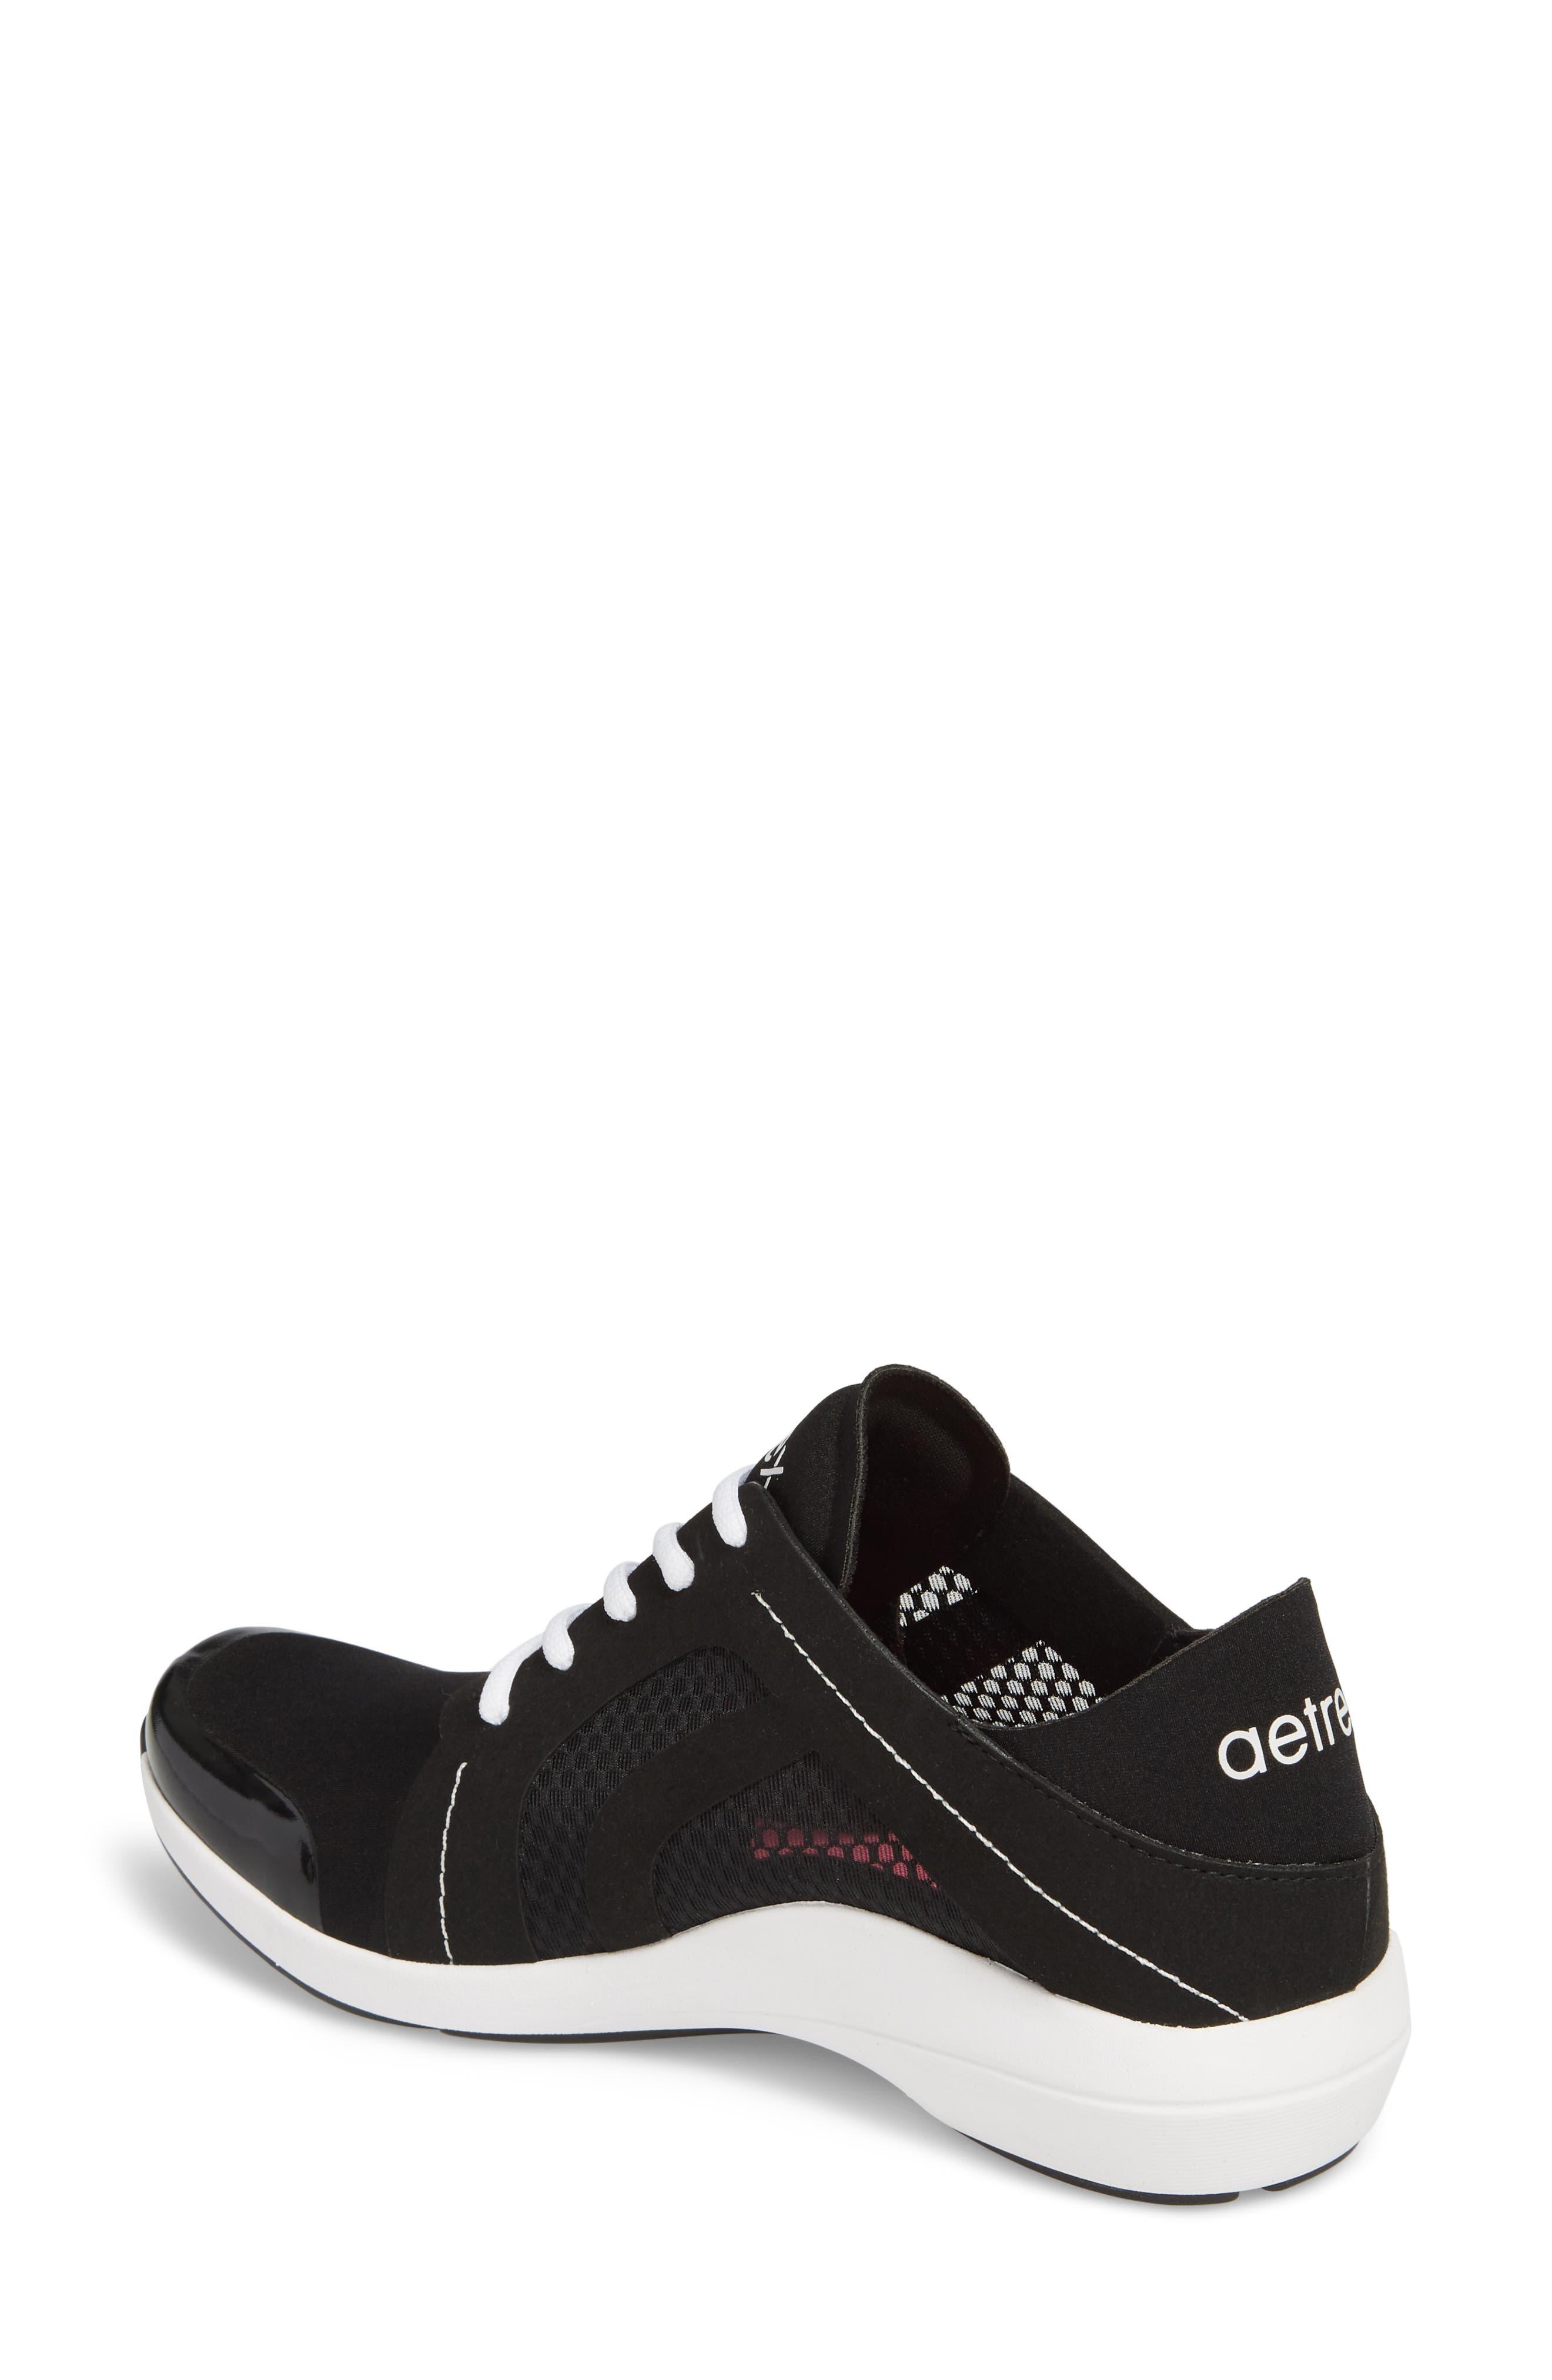 Sloane Sneaker,                             Alternate thumbnail 2, color,                             BLACK FABRIC